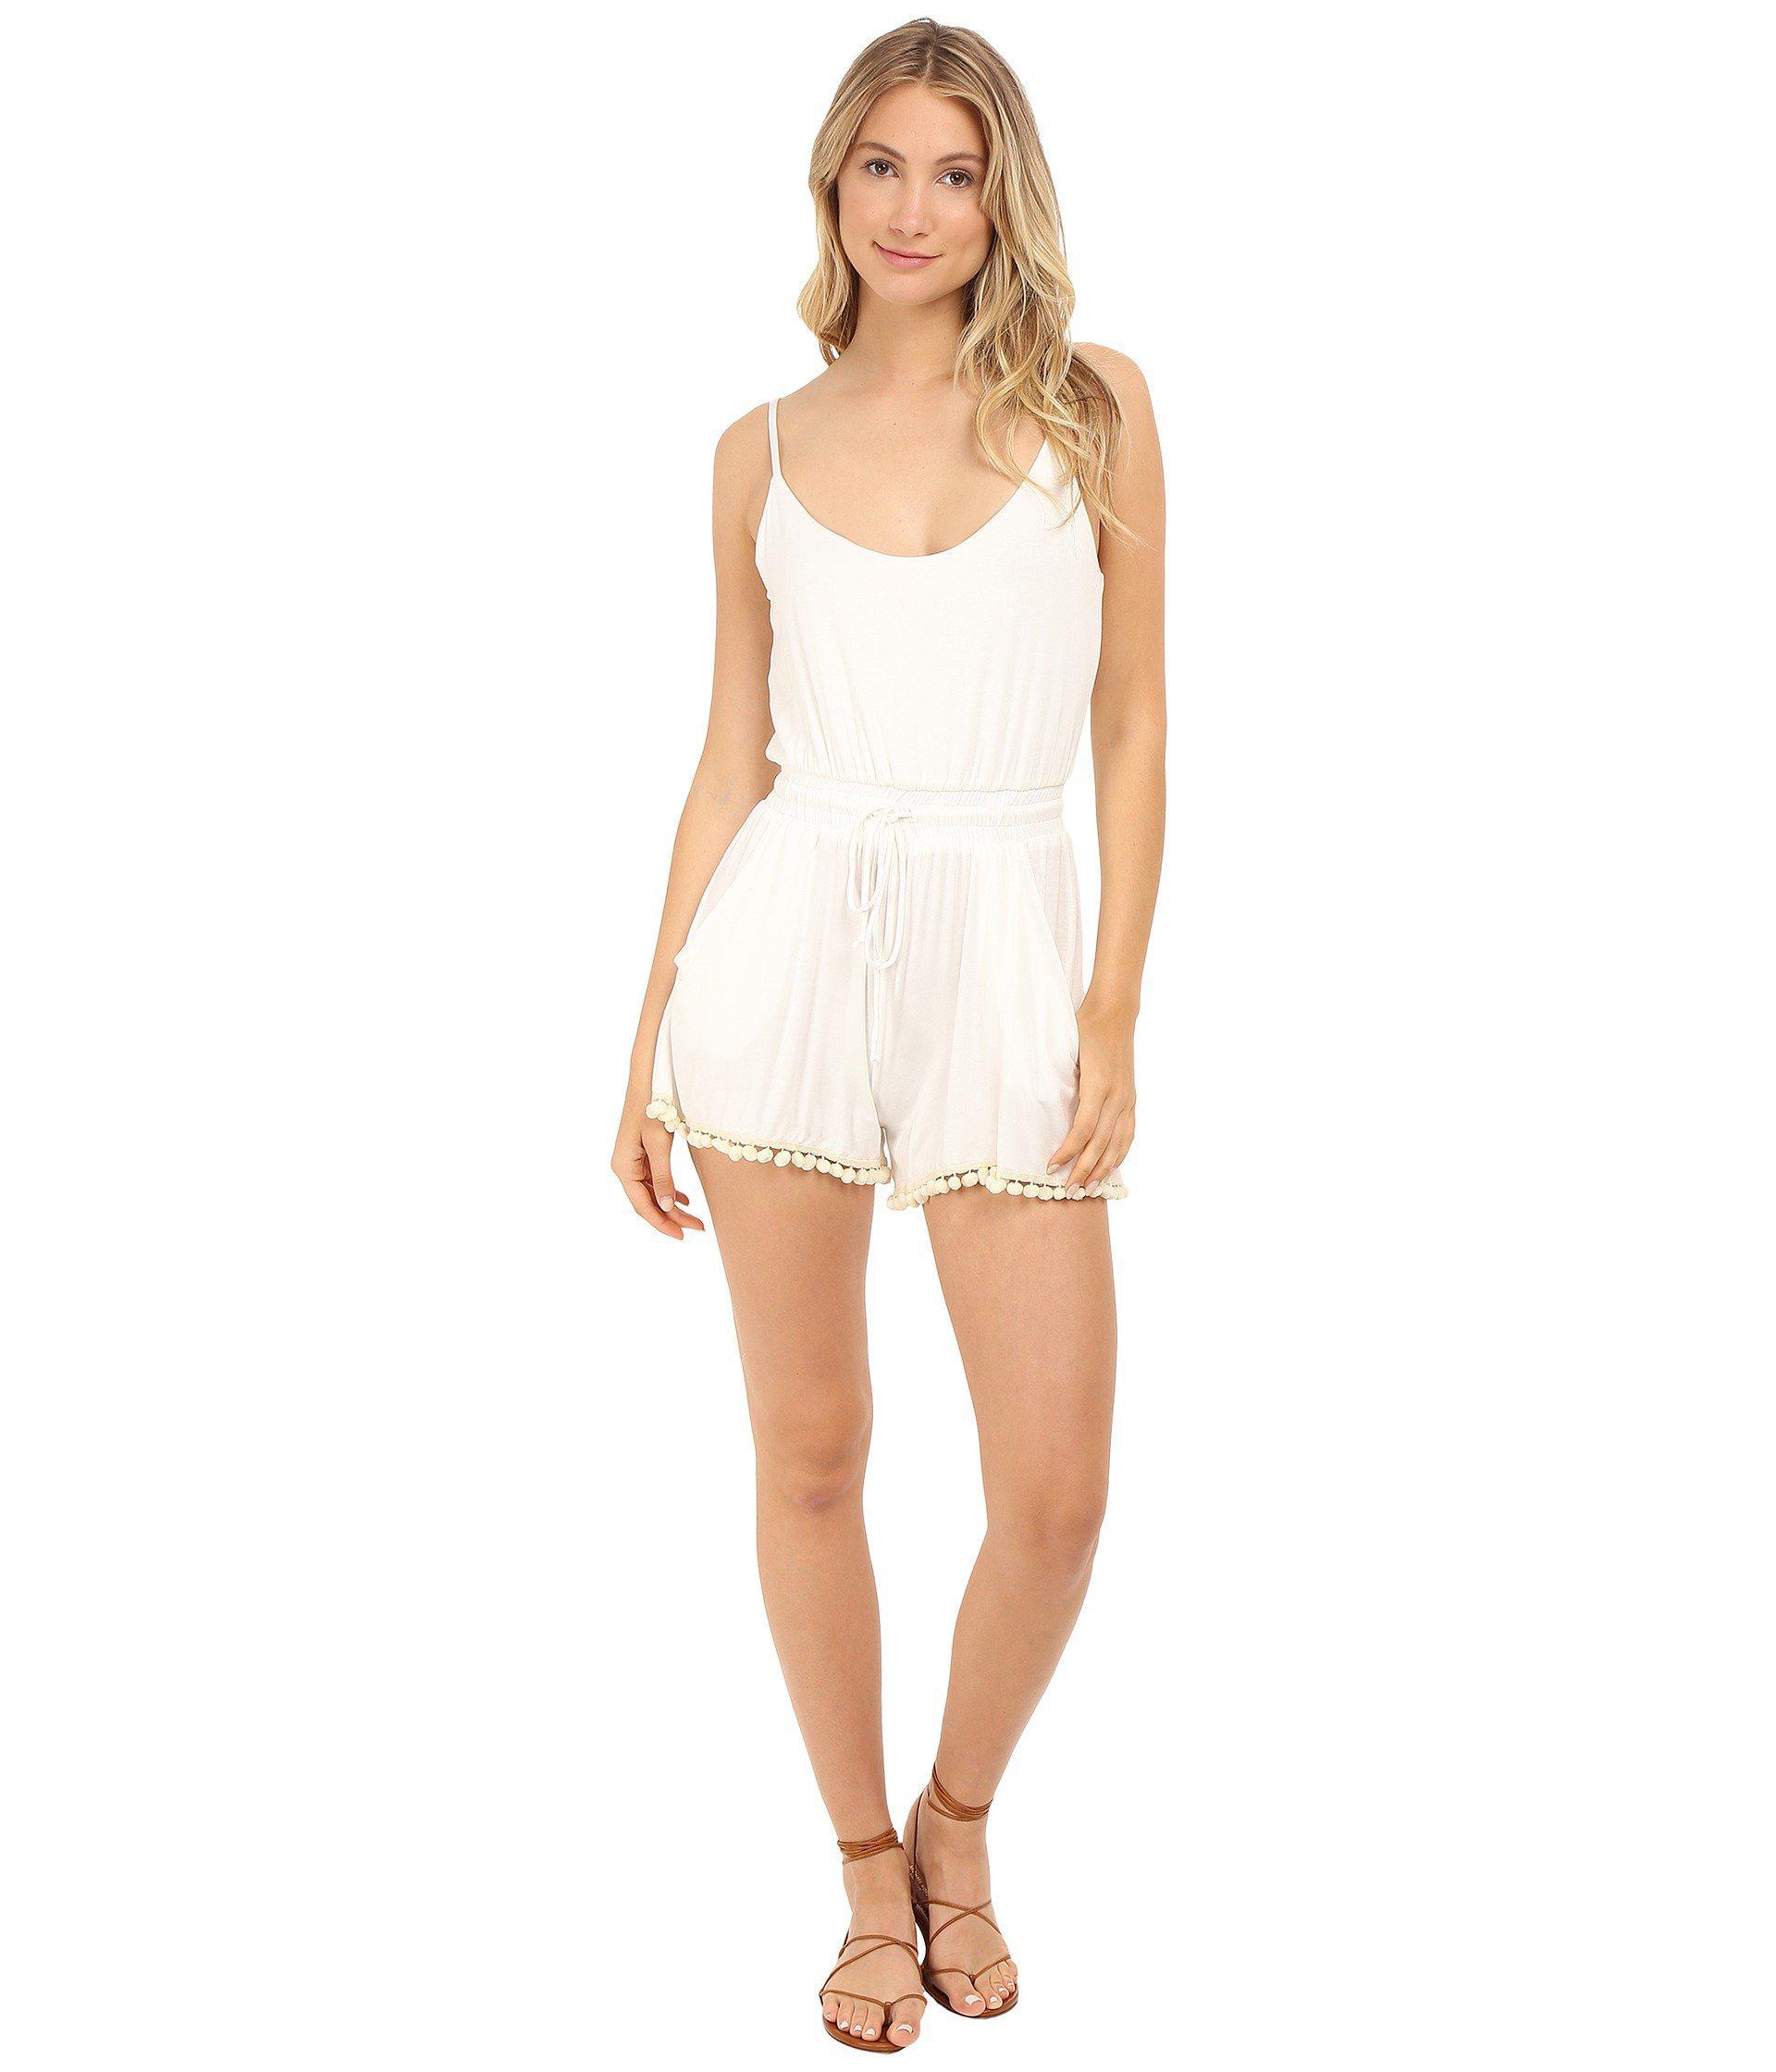 9a9fac4f0434 Lyst - Lucy Love Riley Romper in White